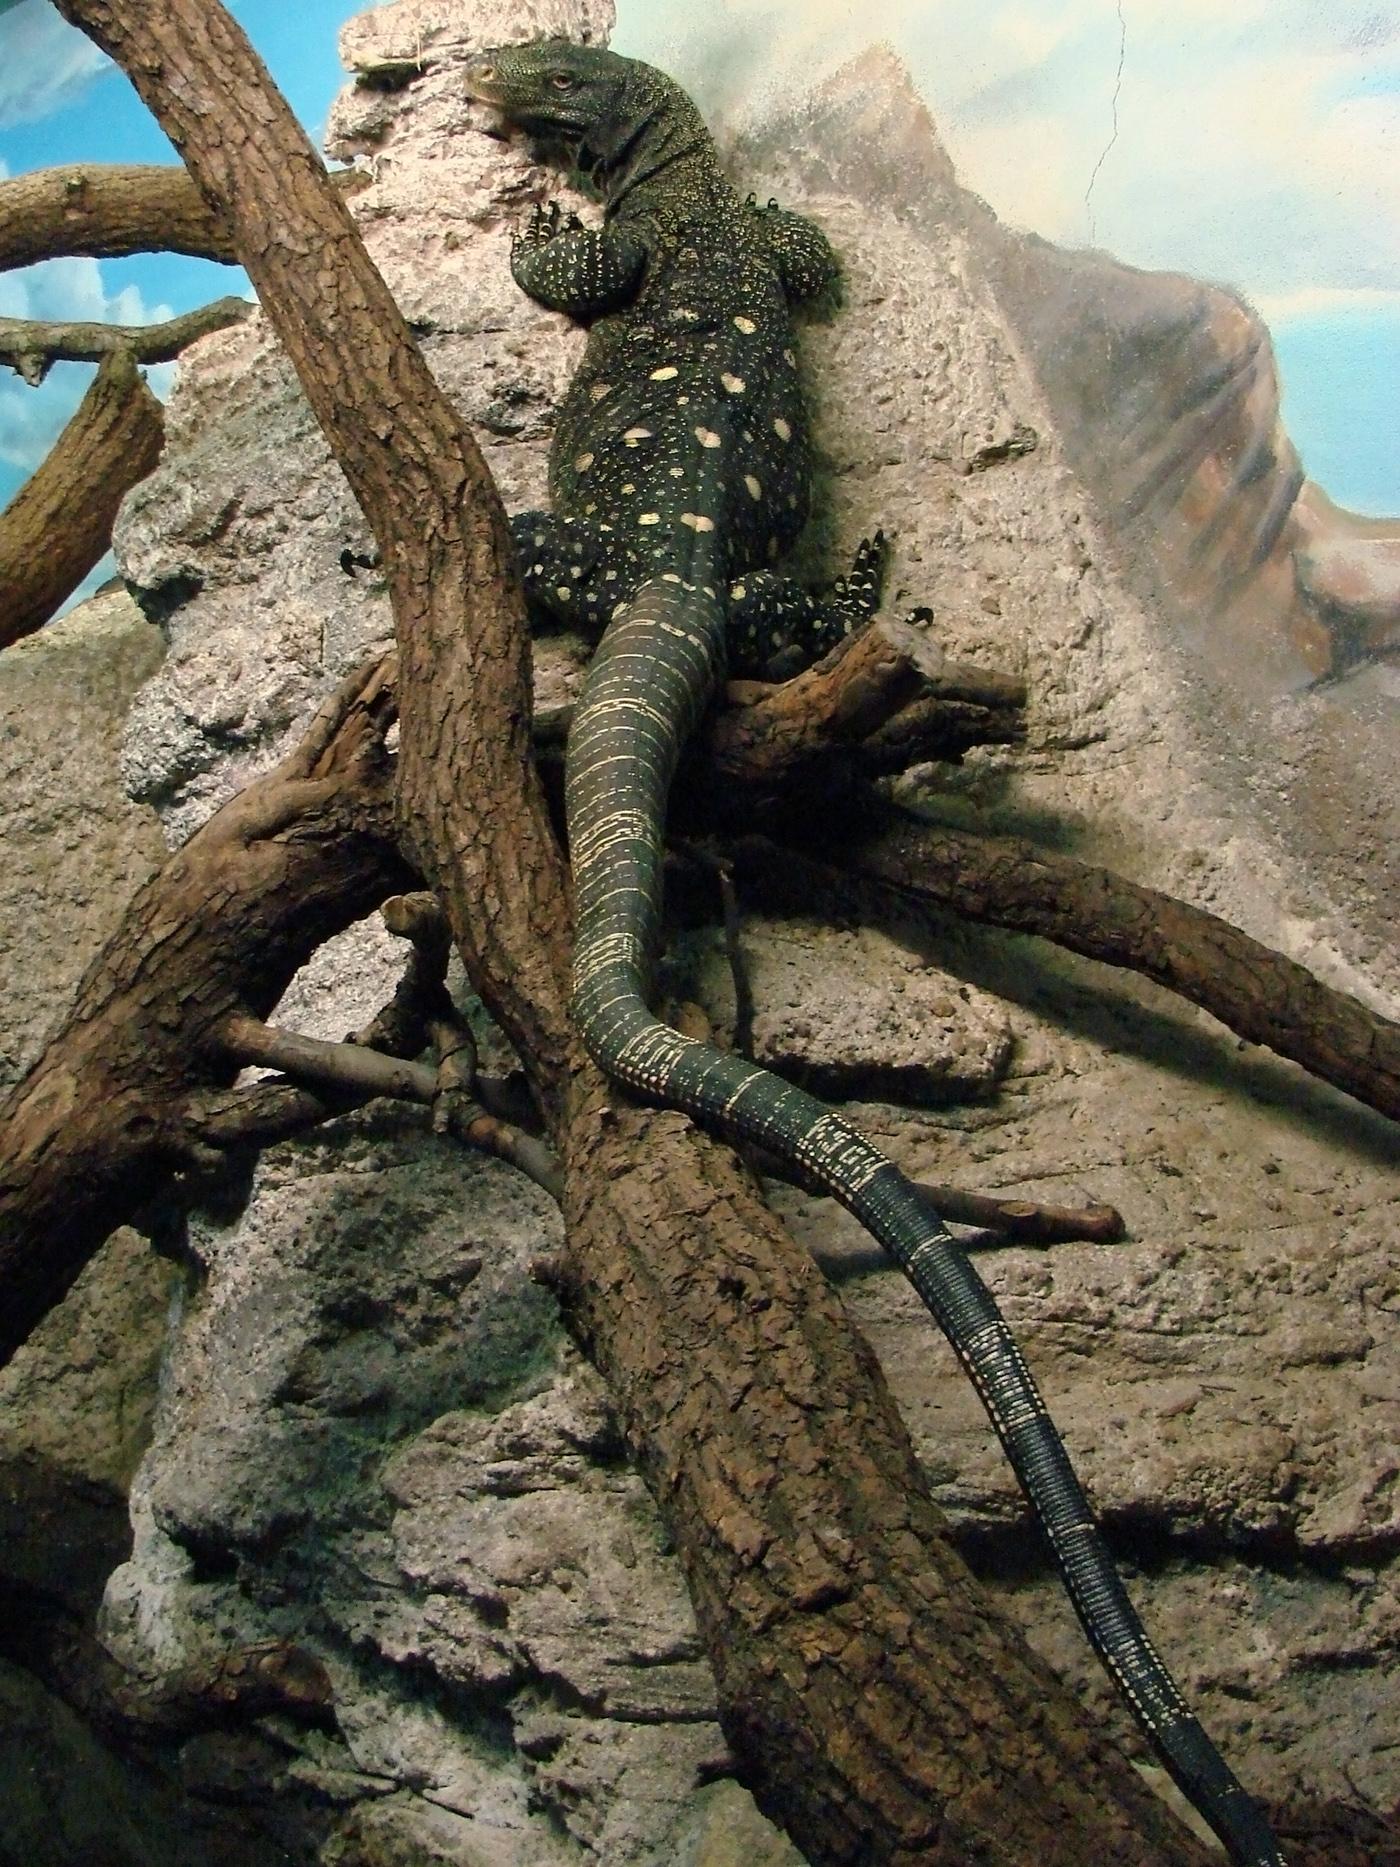 Varanus salvadorii - Wikipedia